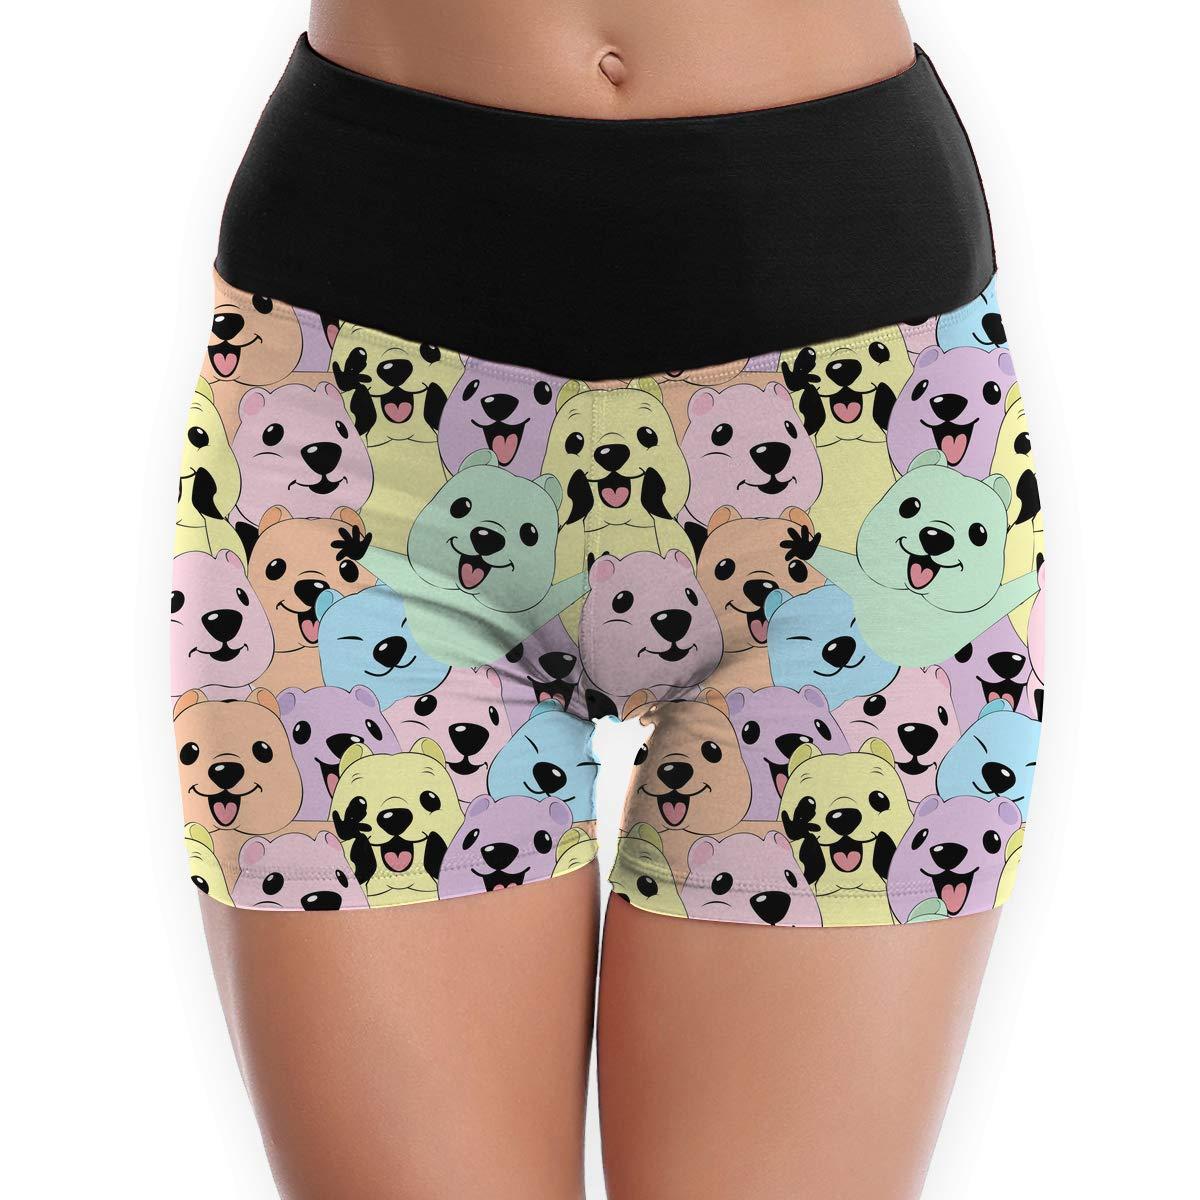 S to XL QfDuank8 Womens Quokka Pattern Power Flex Yoga Shorts Tummy Control Sports Pants